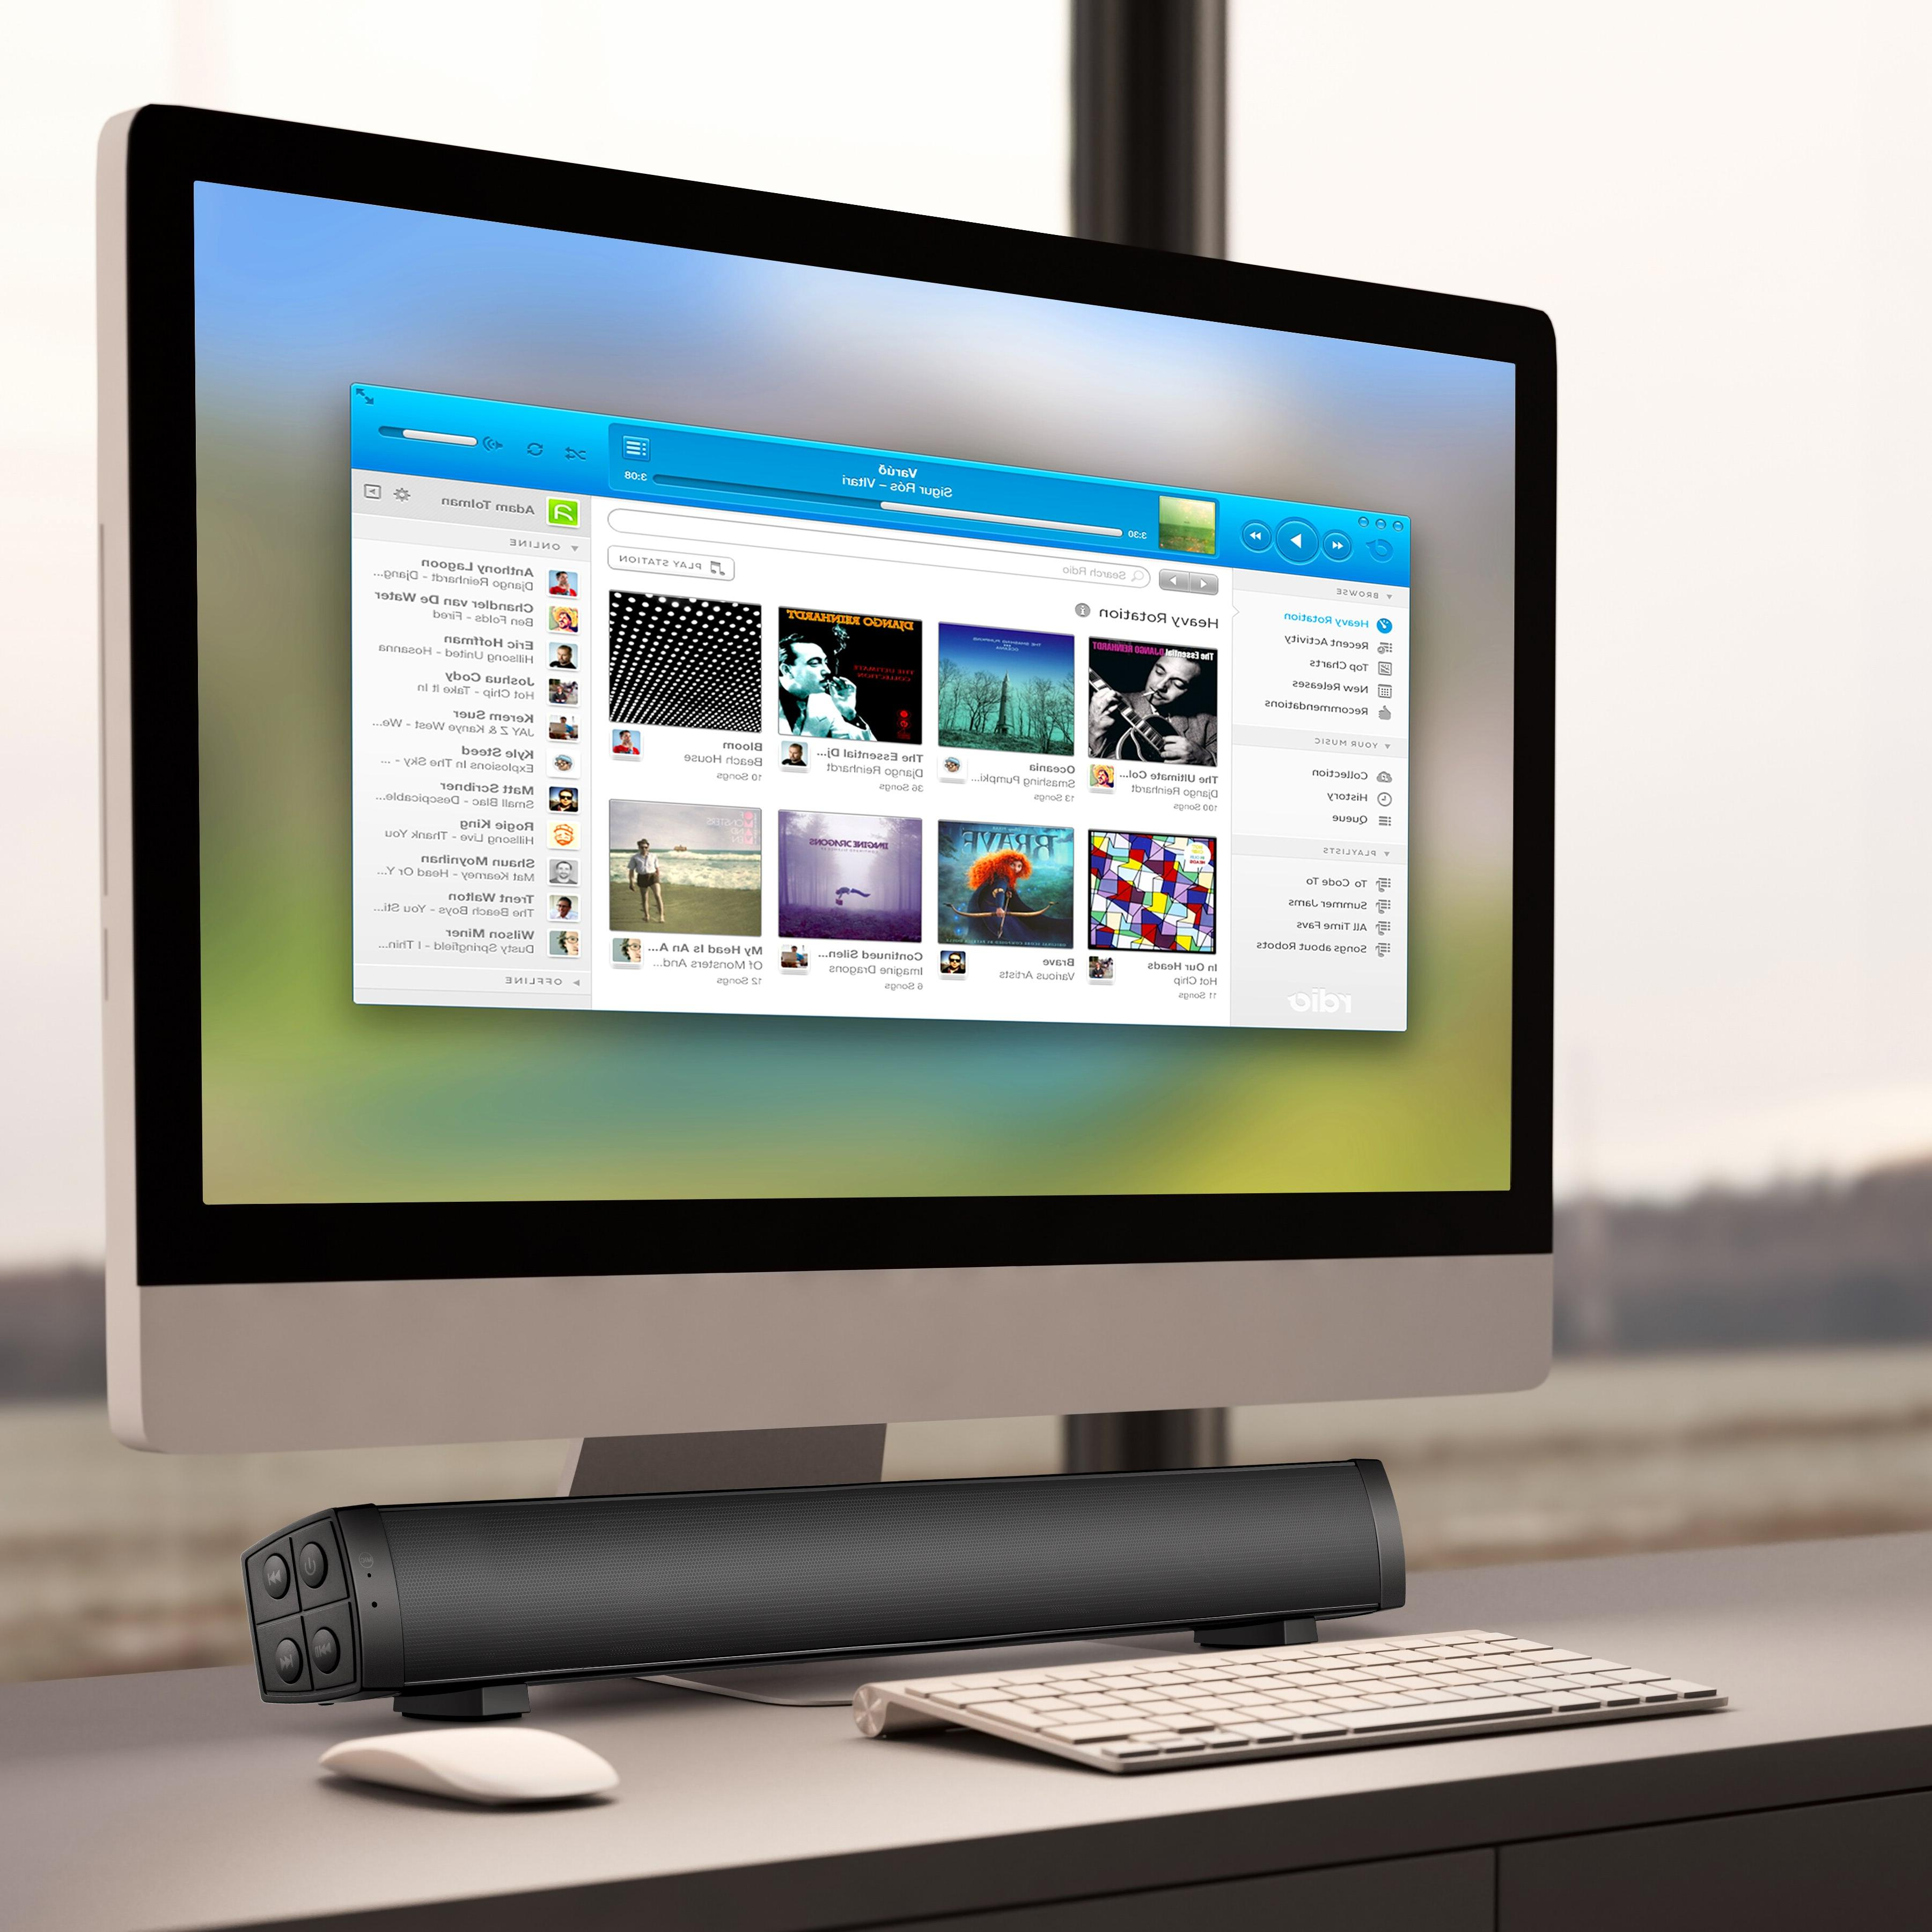 Bluetooth Wireless for Theater <font><b>Surround</b></font> <font><b>Sound</b></font>